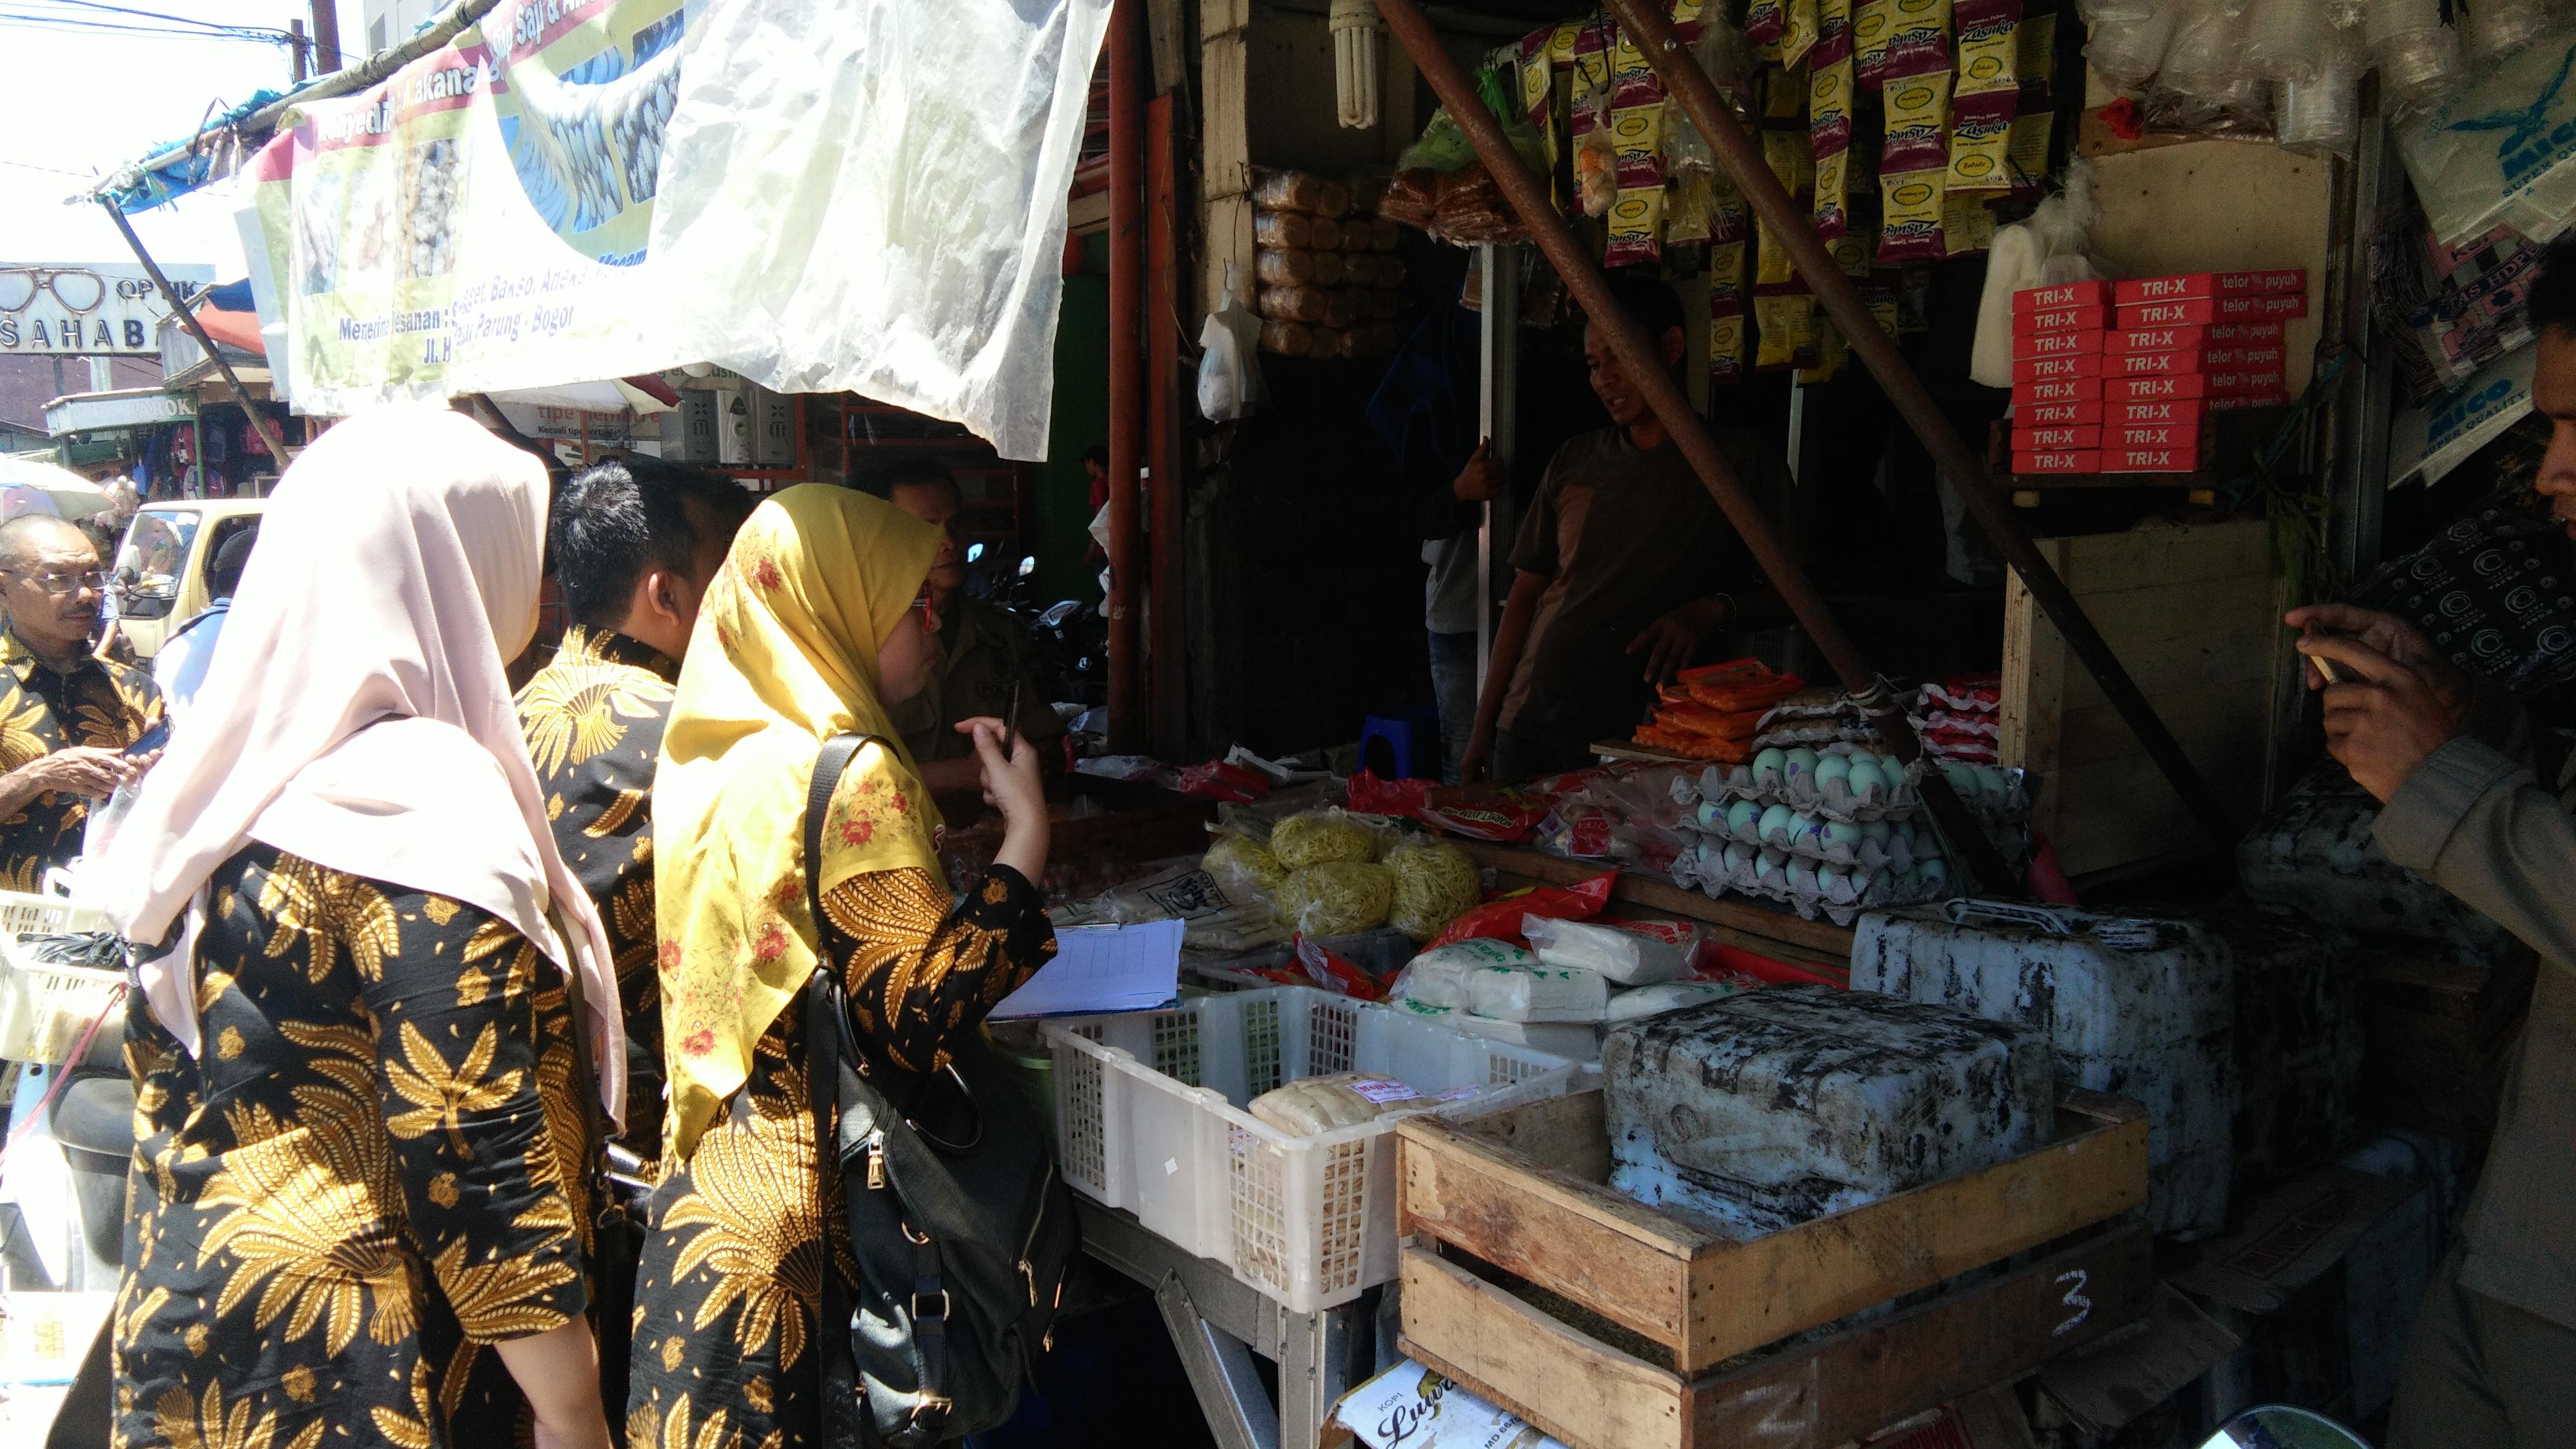 Uji Keamanan Pangan yang dilakukan oleh Dinas Ketahanan Pangan di Pasar Parung